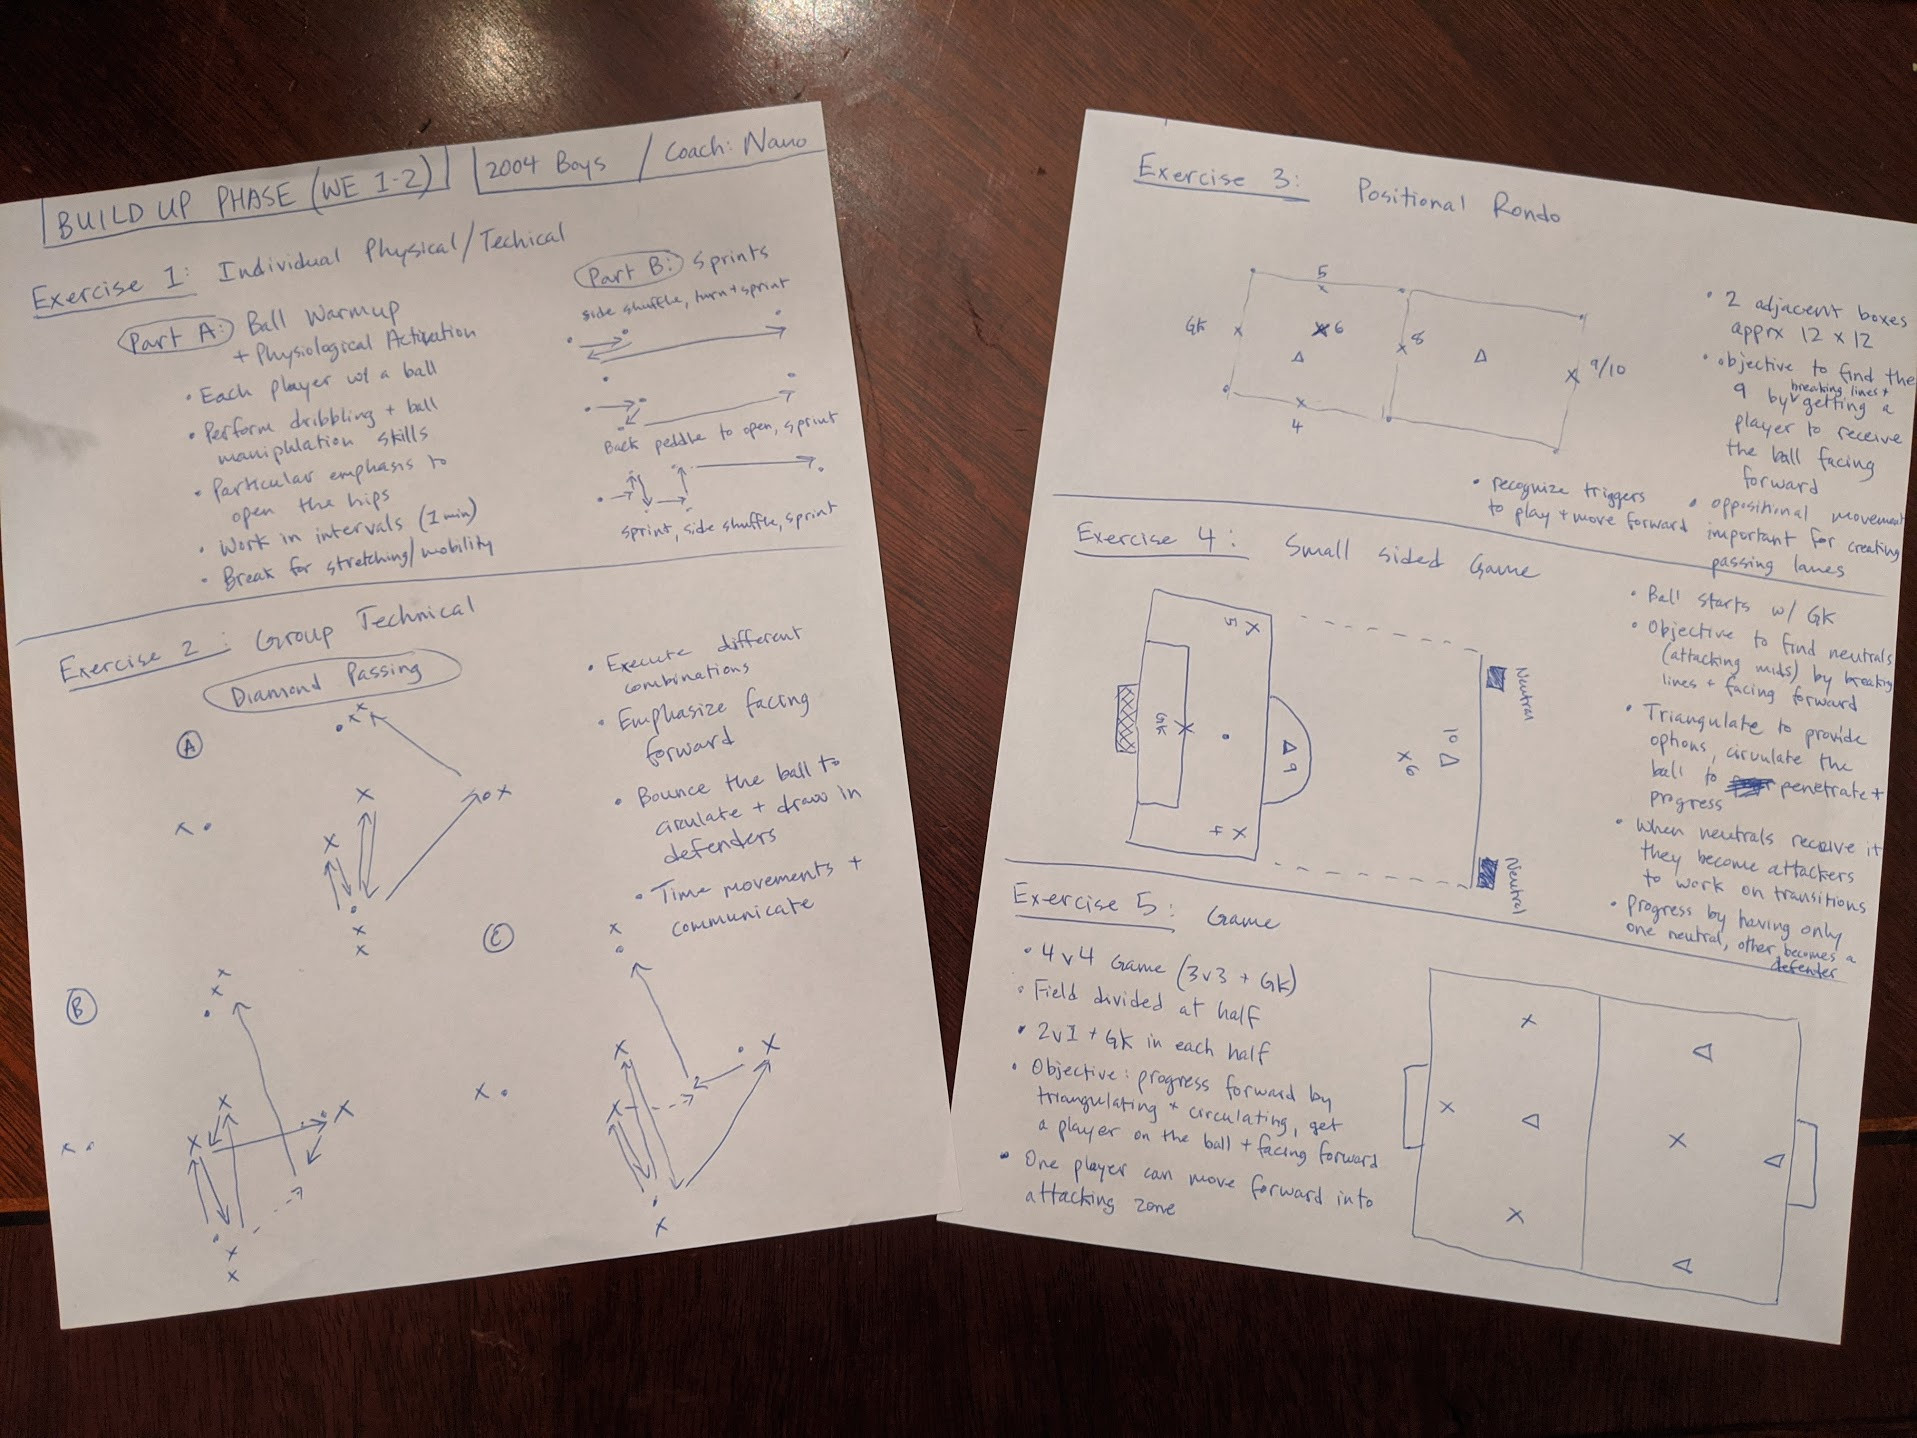 Custom Session Planning